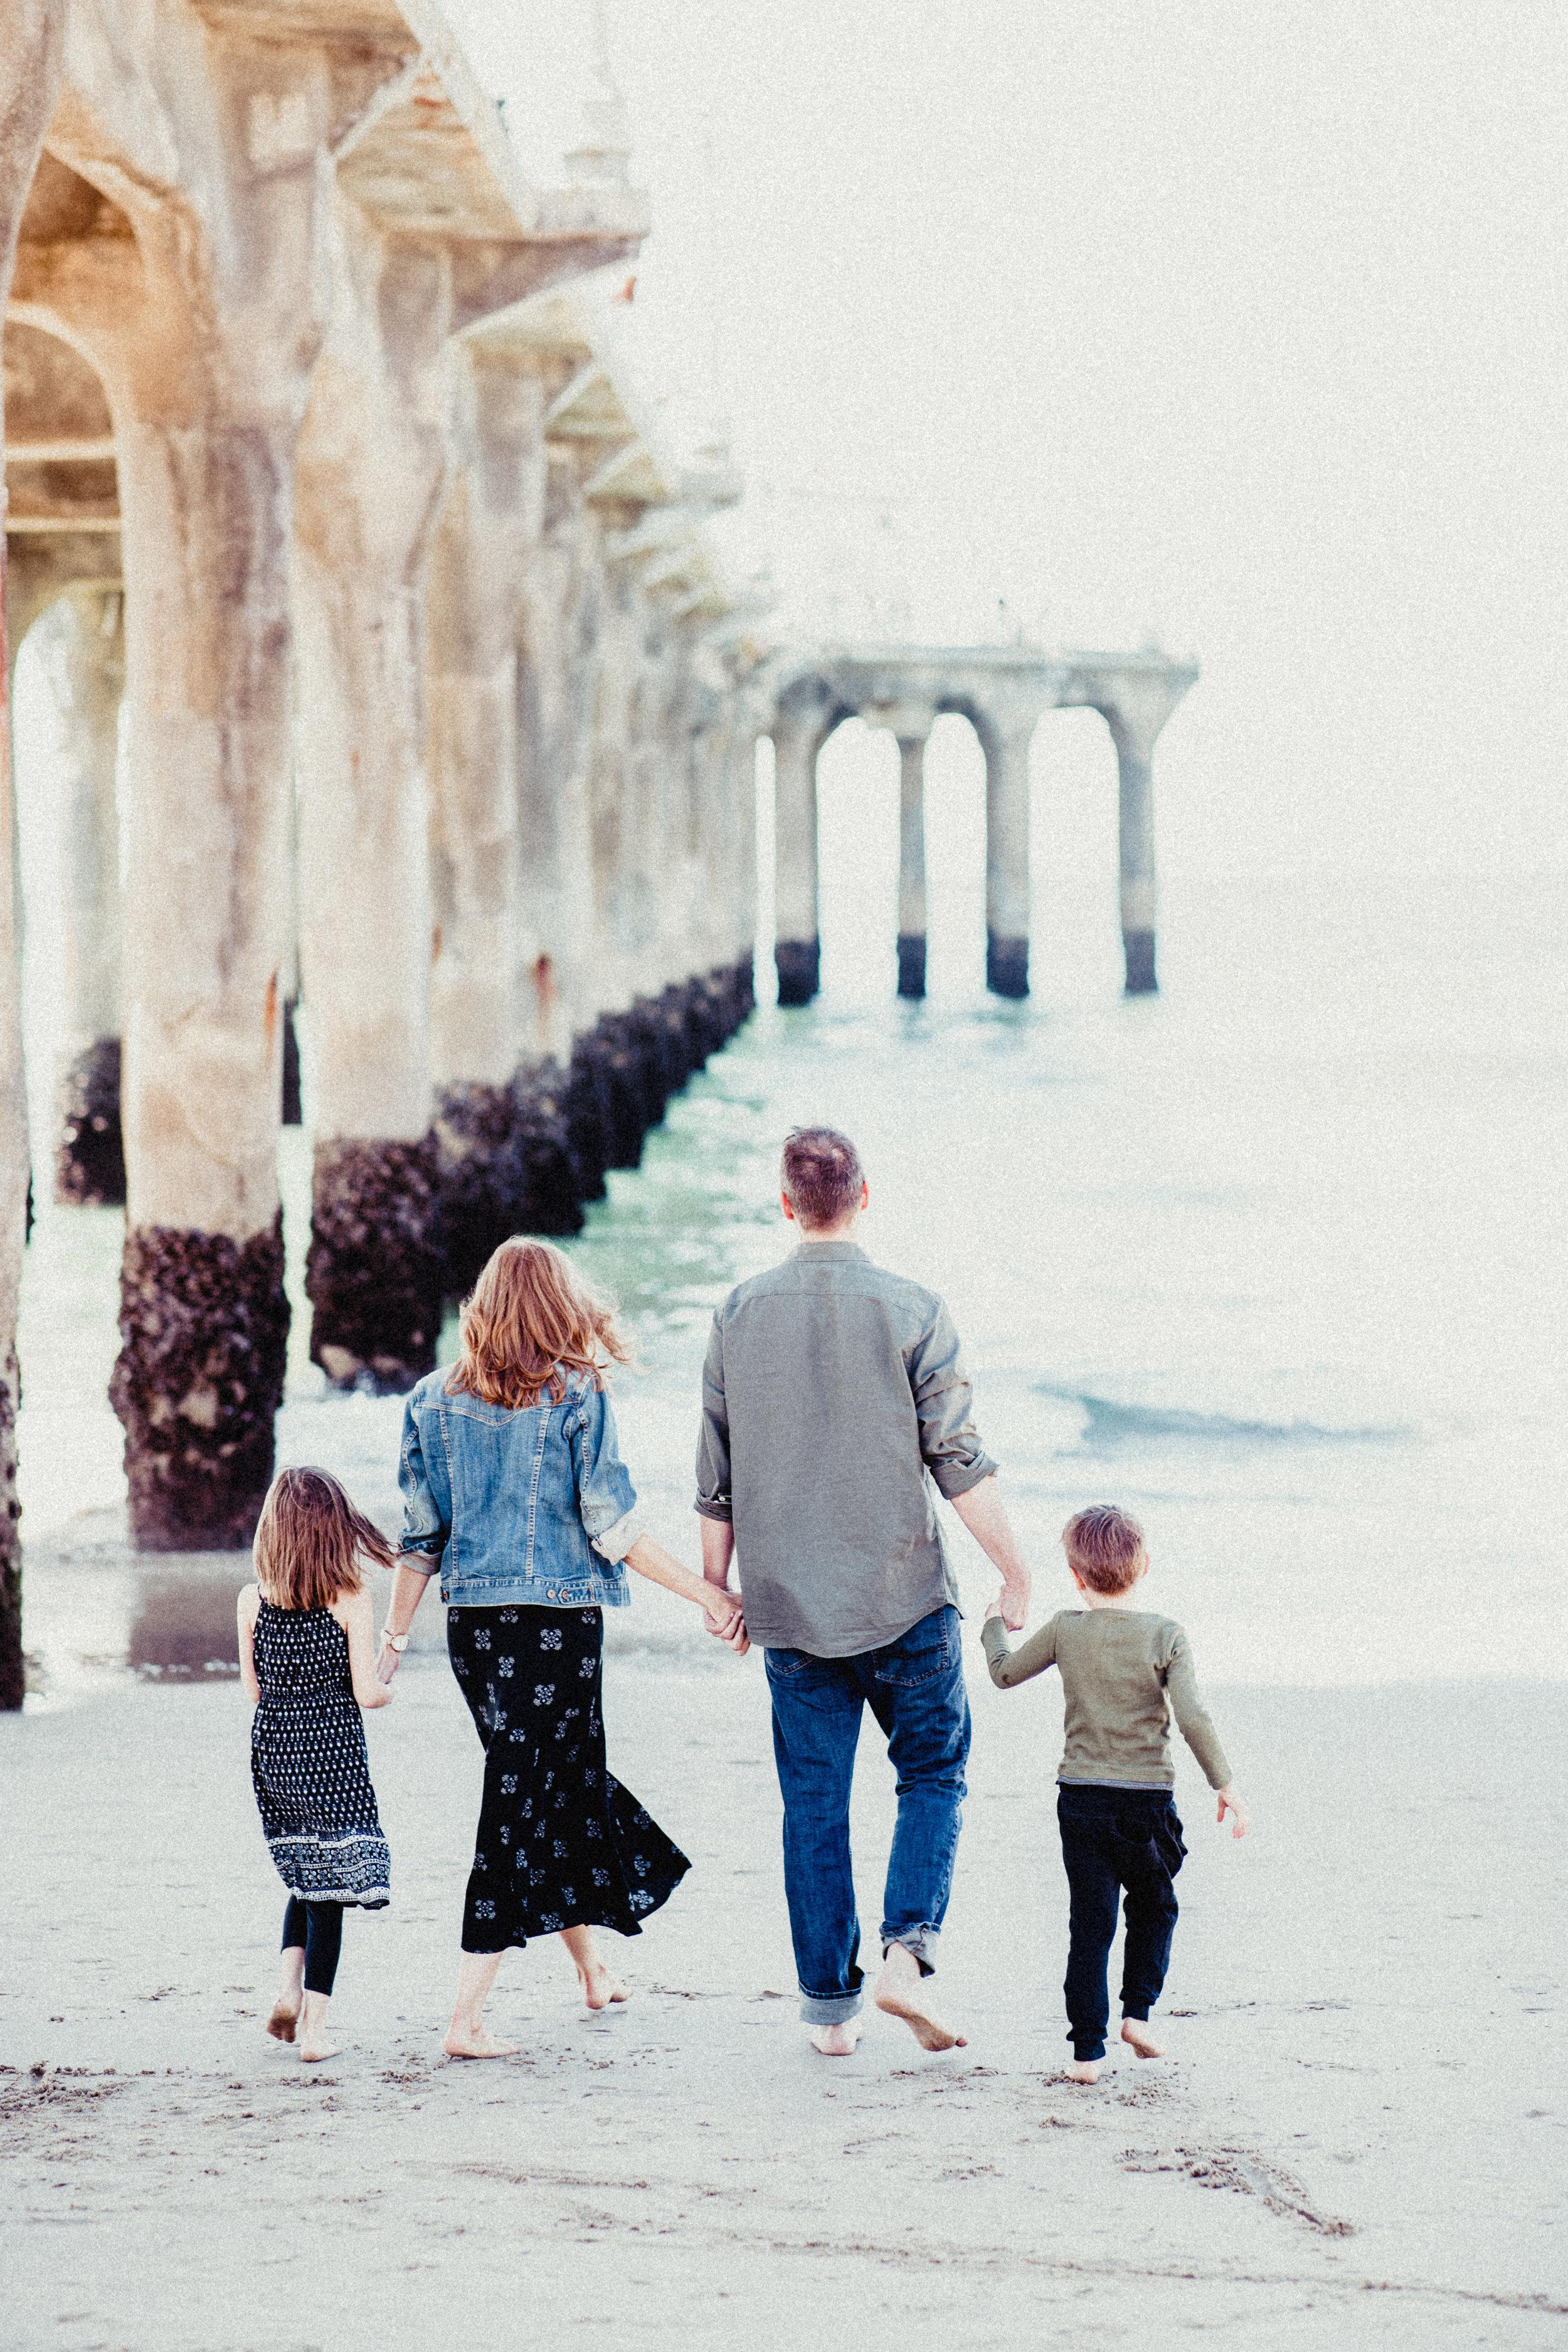 la manhatten beach photo shooting family portraits12.jpeg